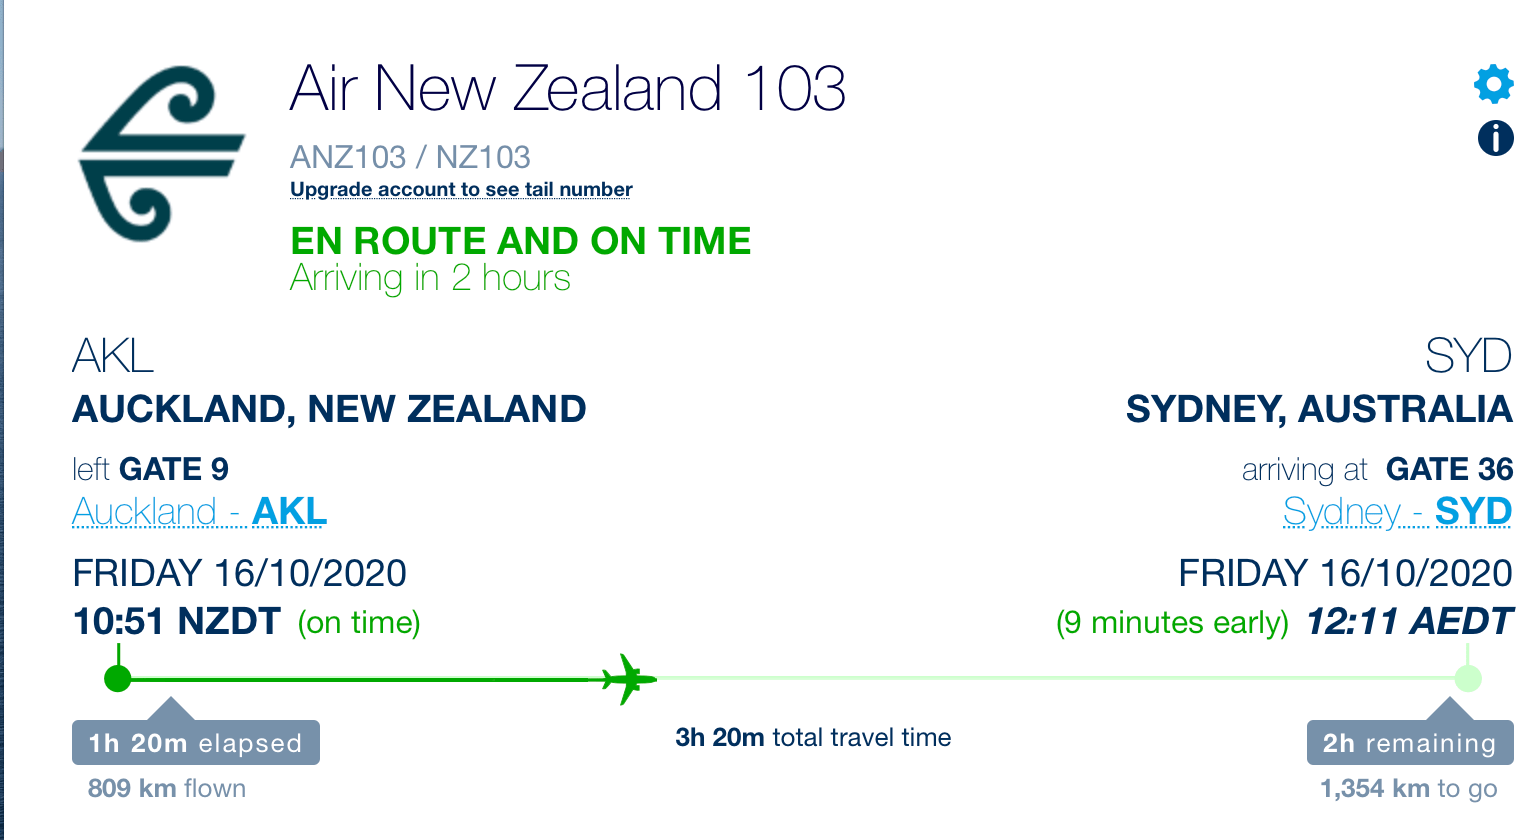 Air New Zealand Flight Auckland to Sydney